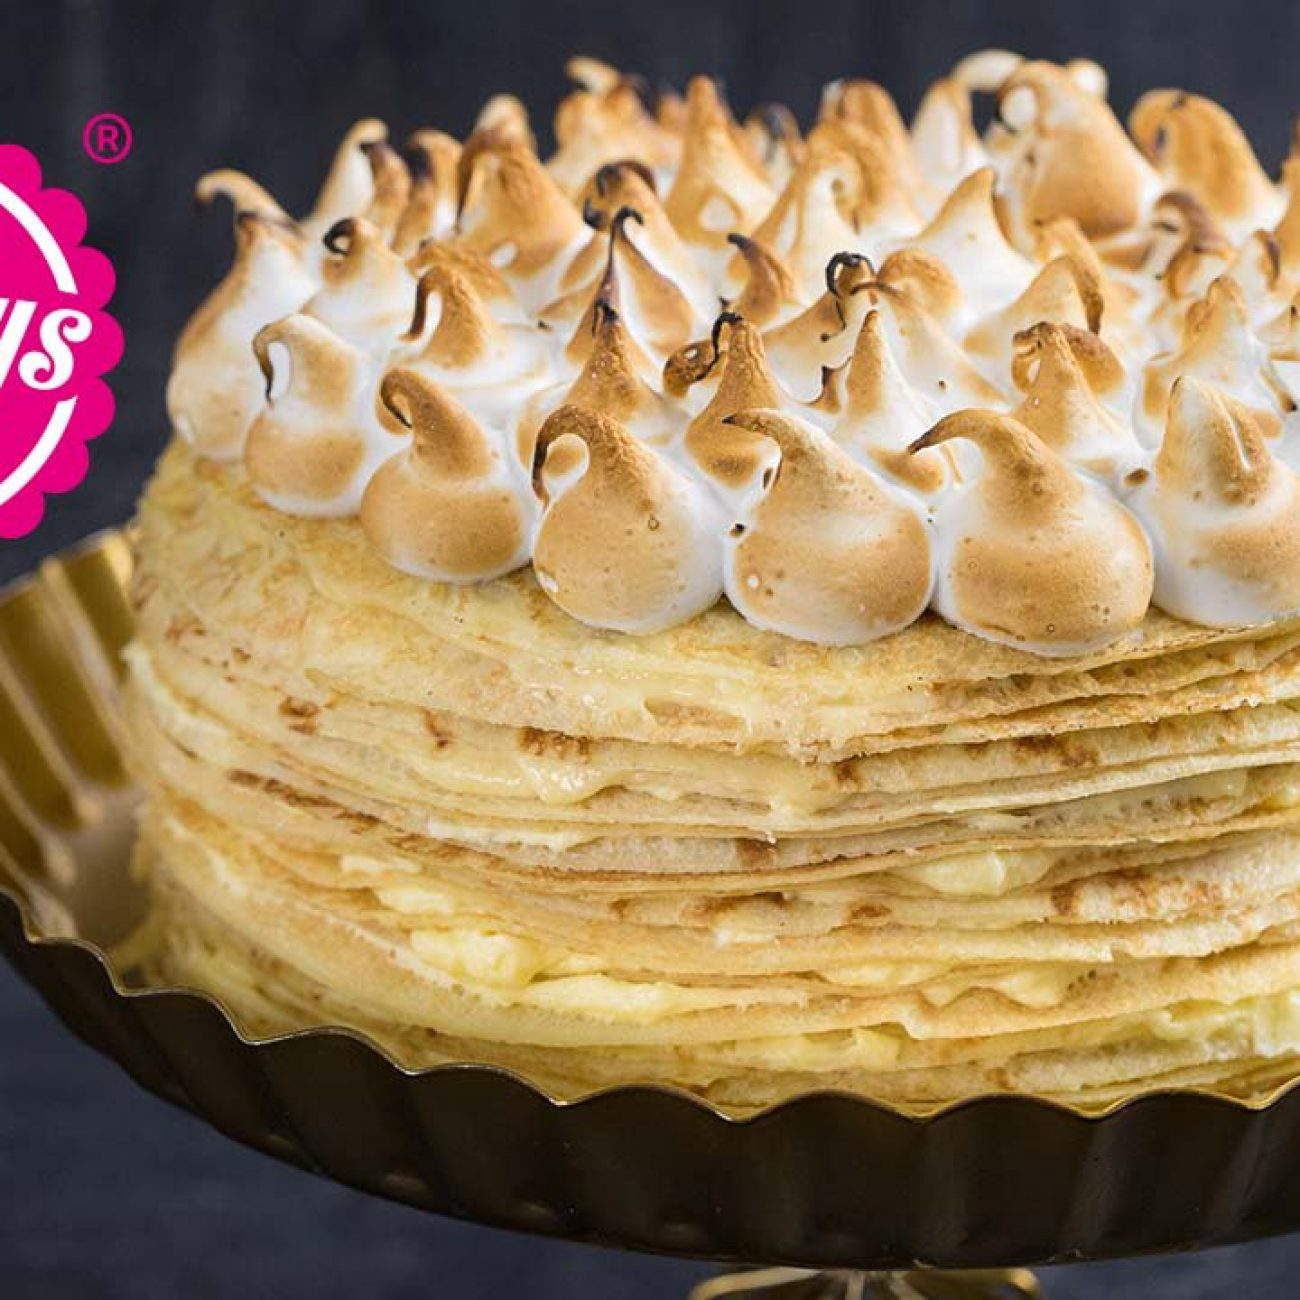 Crêpes-Torte mit Lemoncurd Füllung und Baiserhaube – Crêpes Tarte au citron